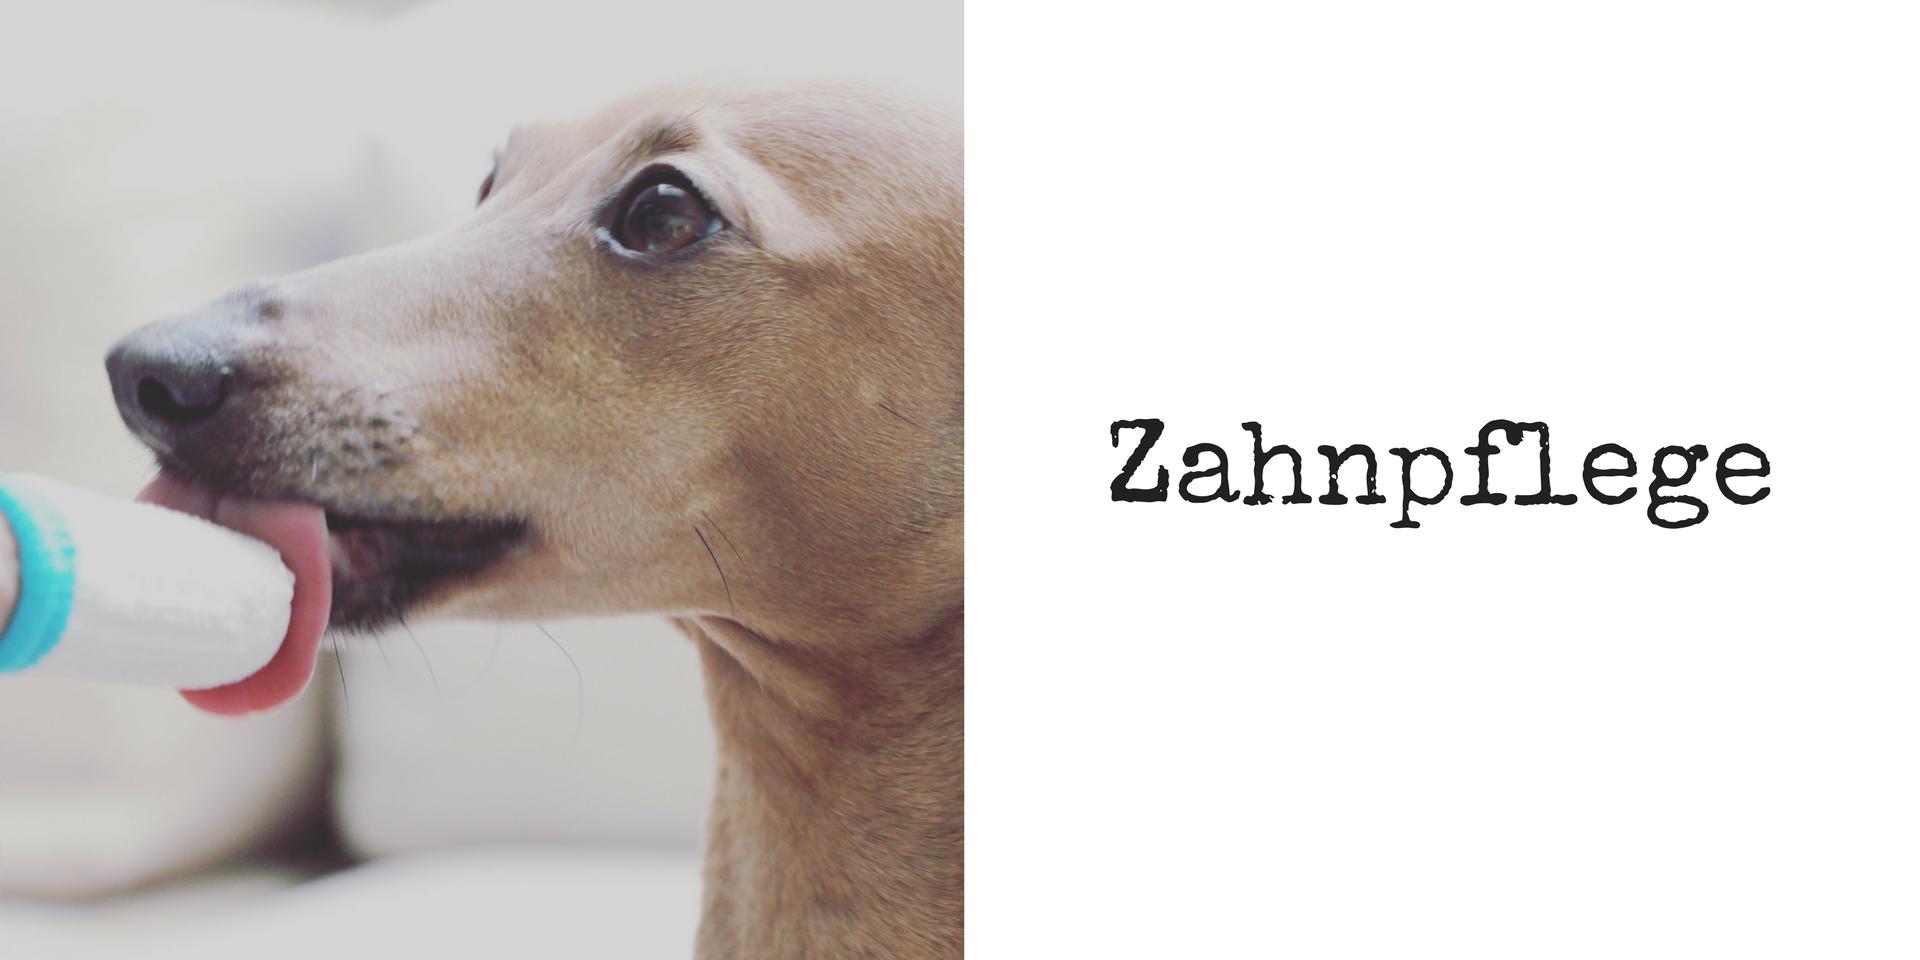 miDoggy Blog Community für Hunde Zahnpflege Pflege